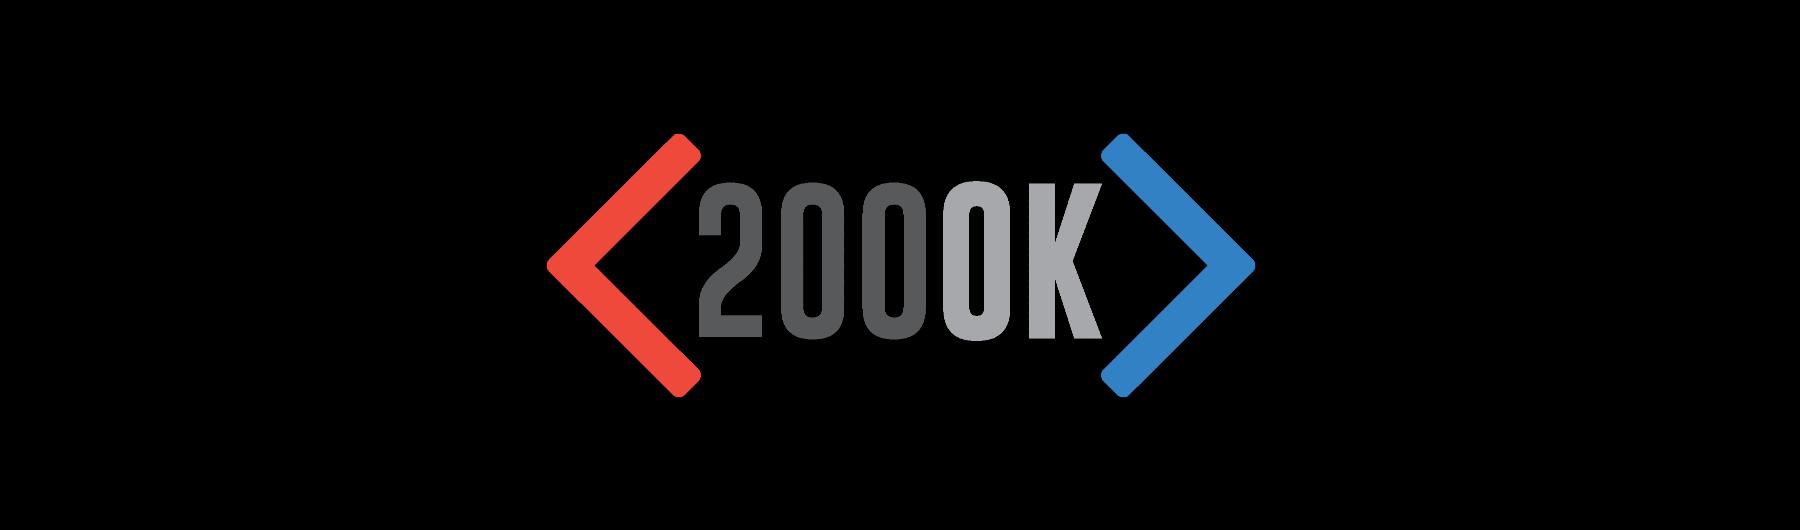 200OK 2020